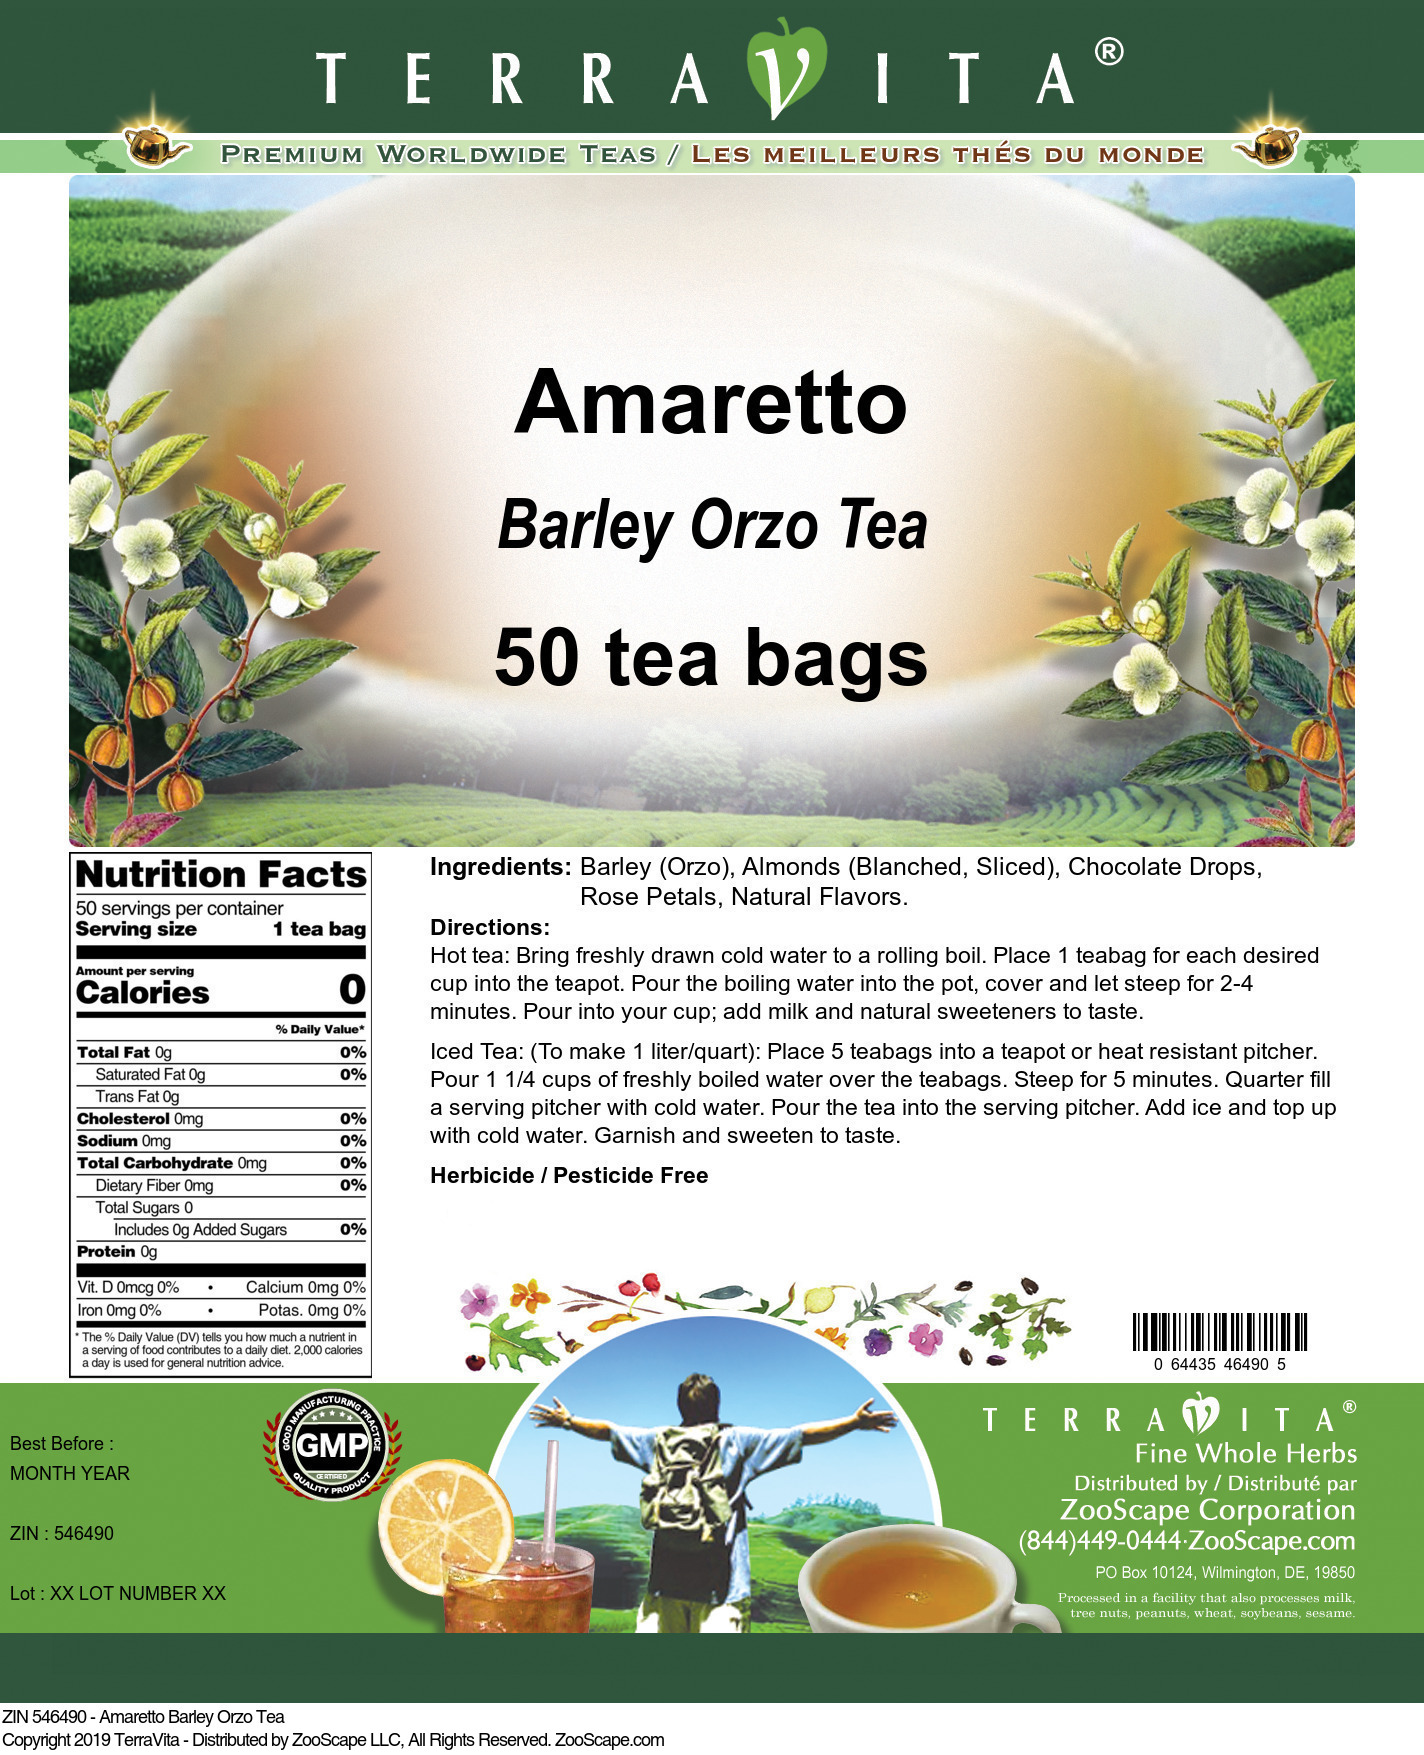 Amaretto Barley Orzo Tea